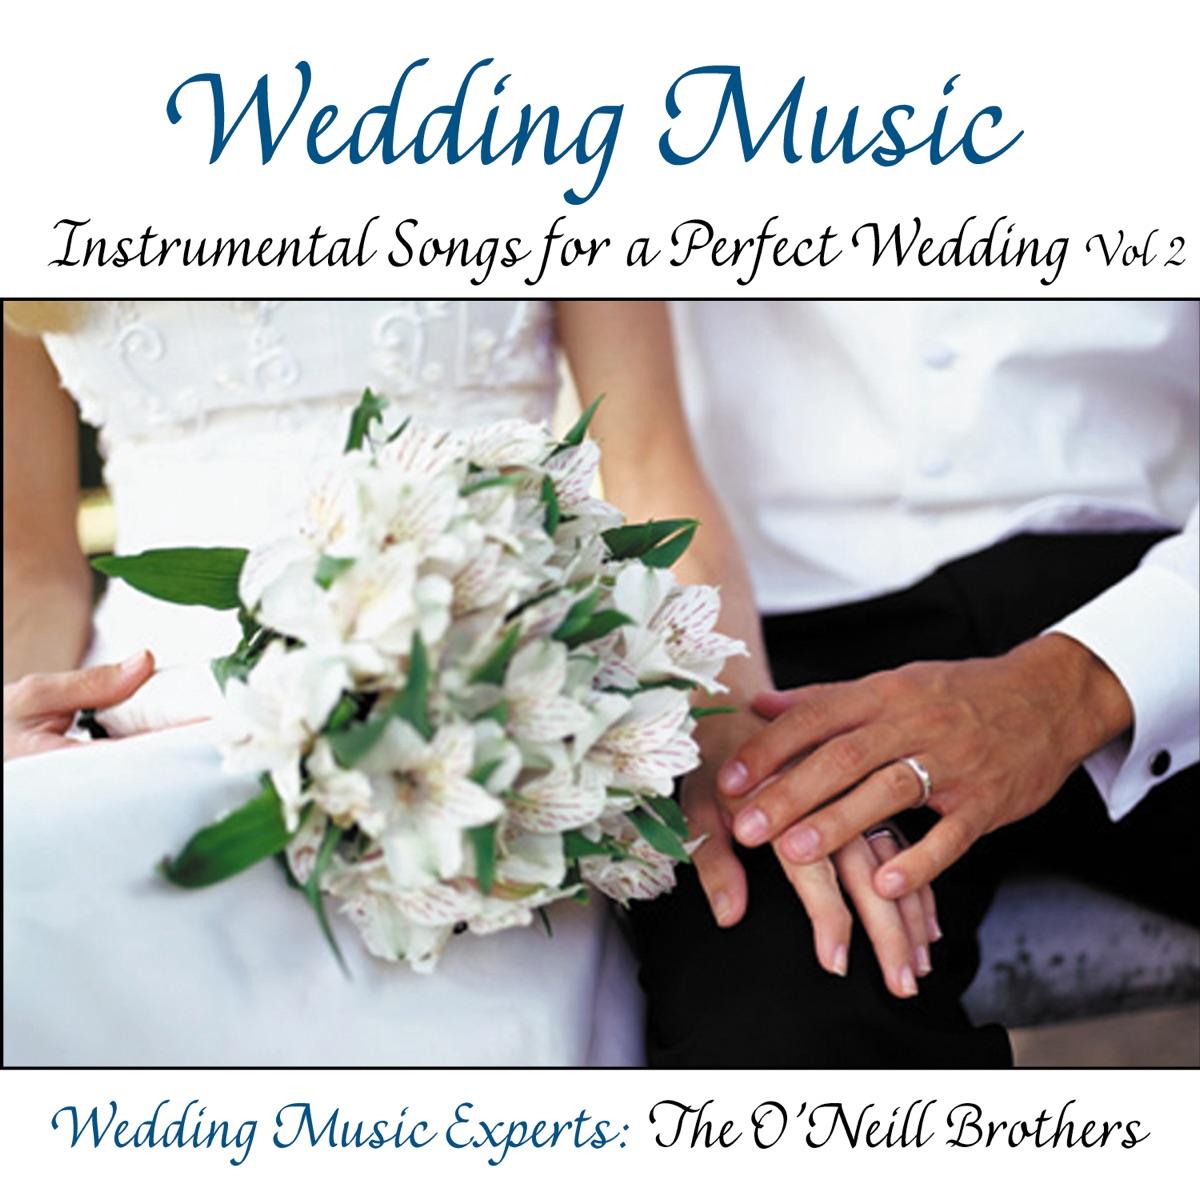 Wedding Music: Instrumental Songs for a Perfect Wedding Vol